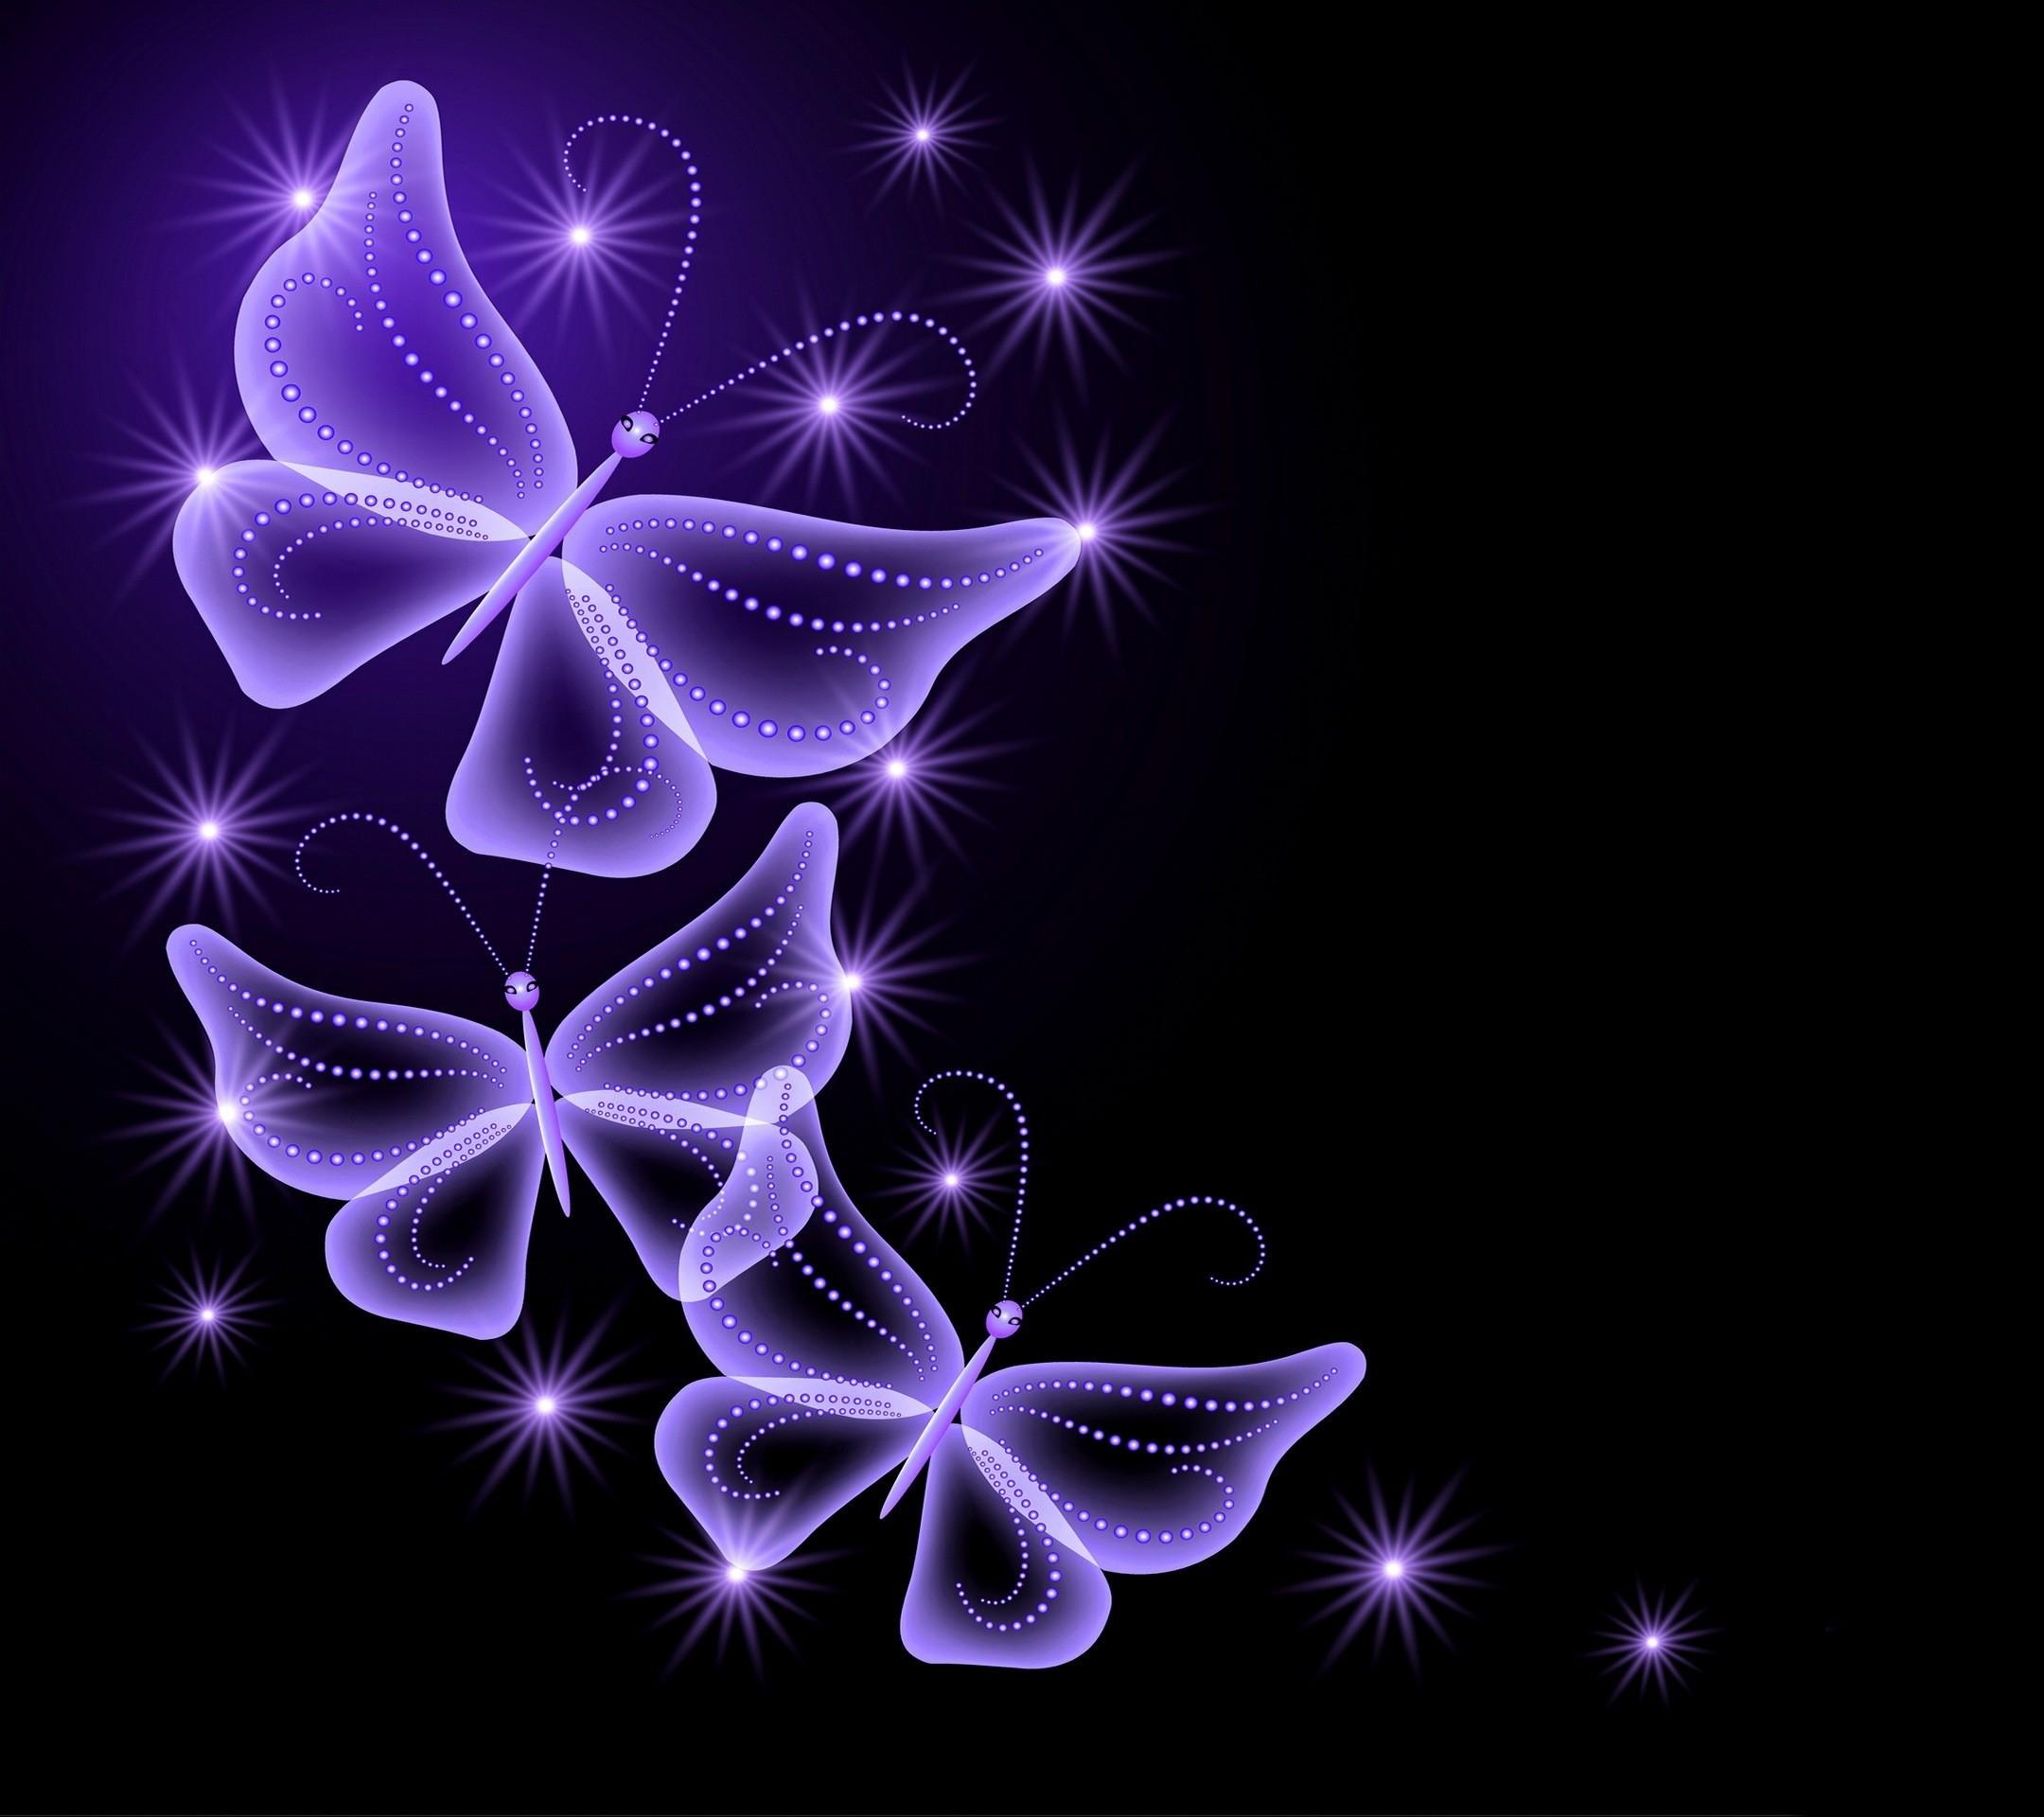 Purple Rose Background Wallpaper | Back > Wallpapers For > Purple Rose  Butterfly Background